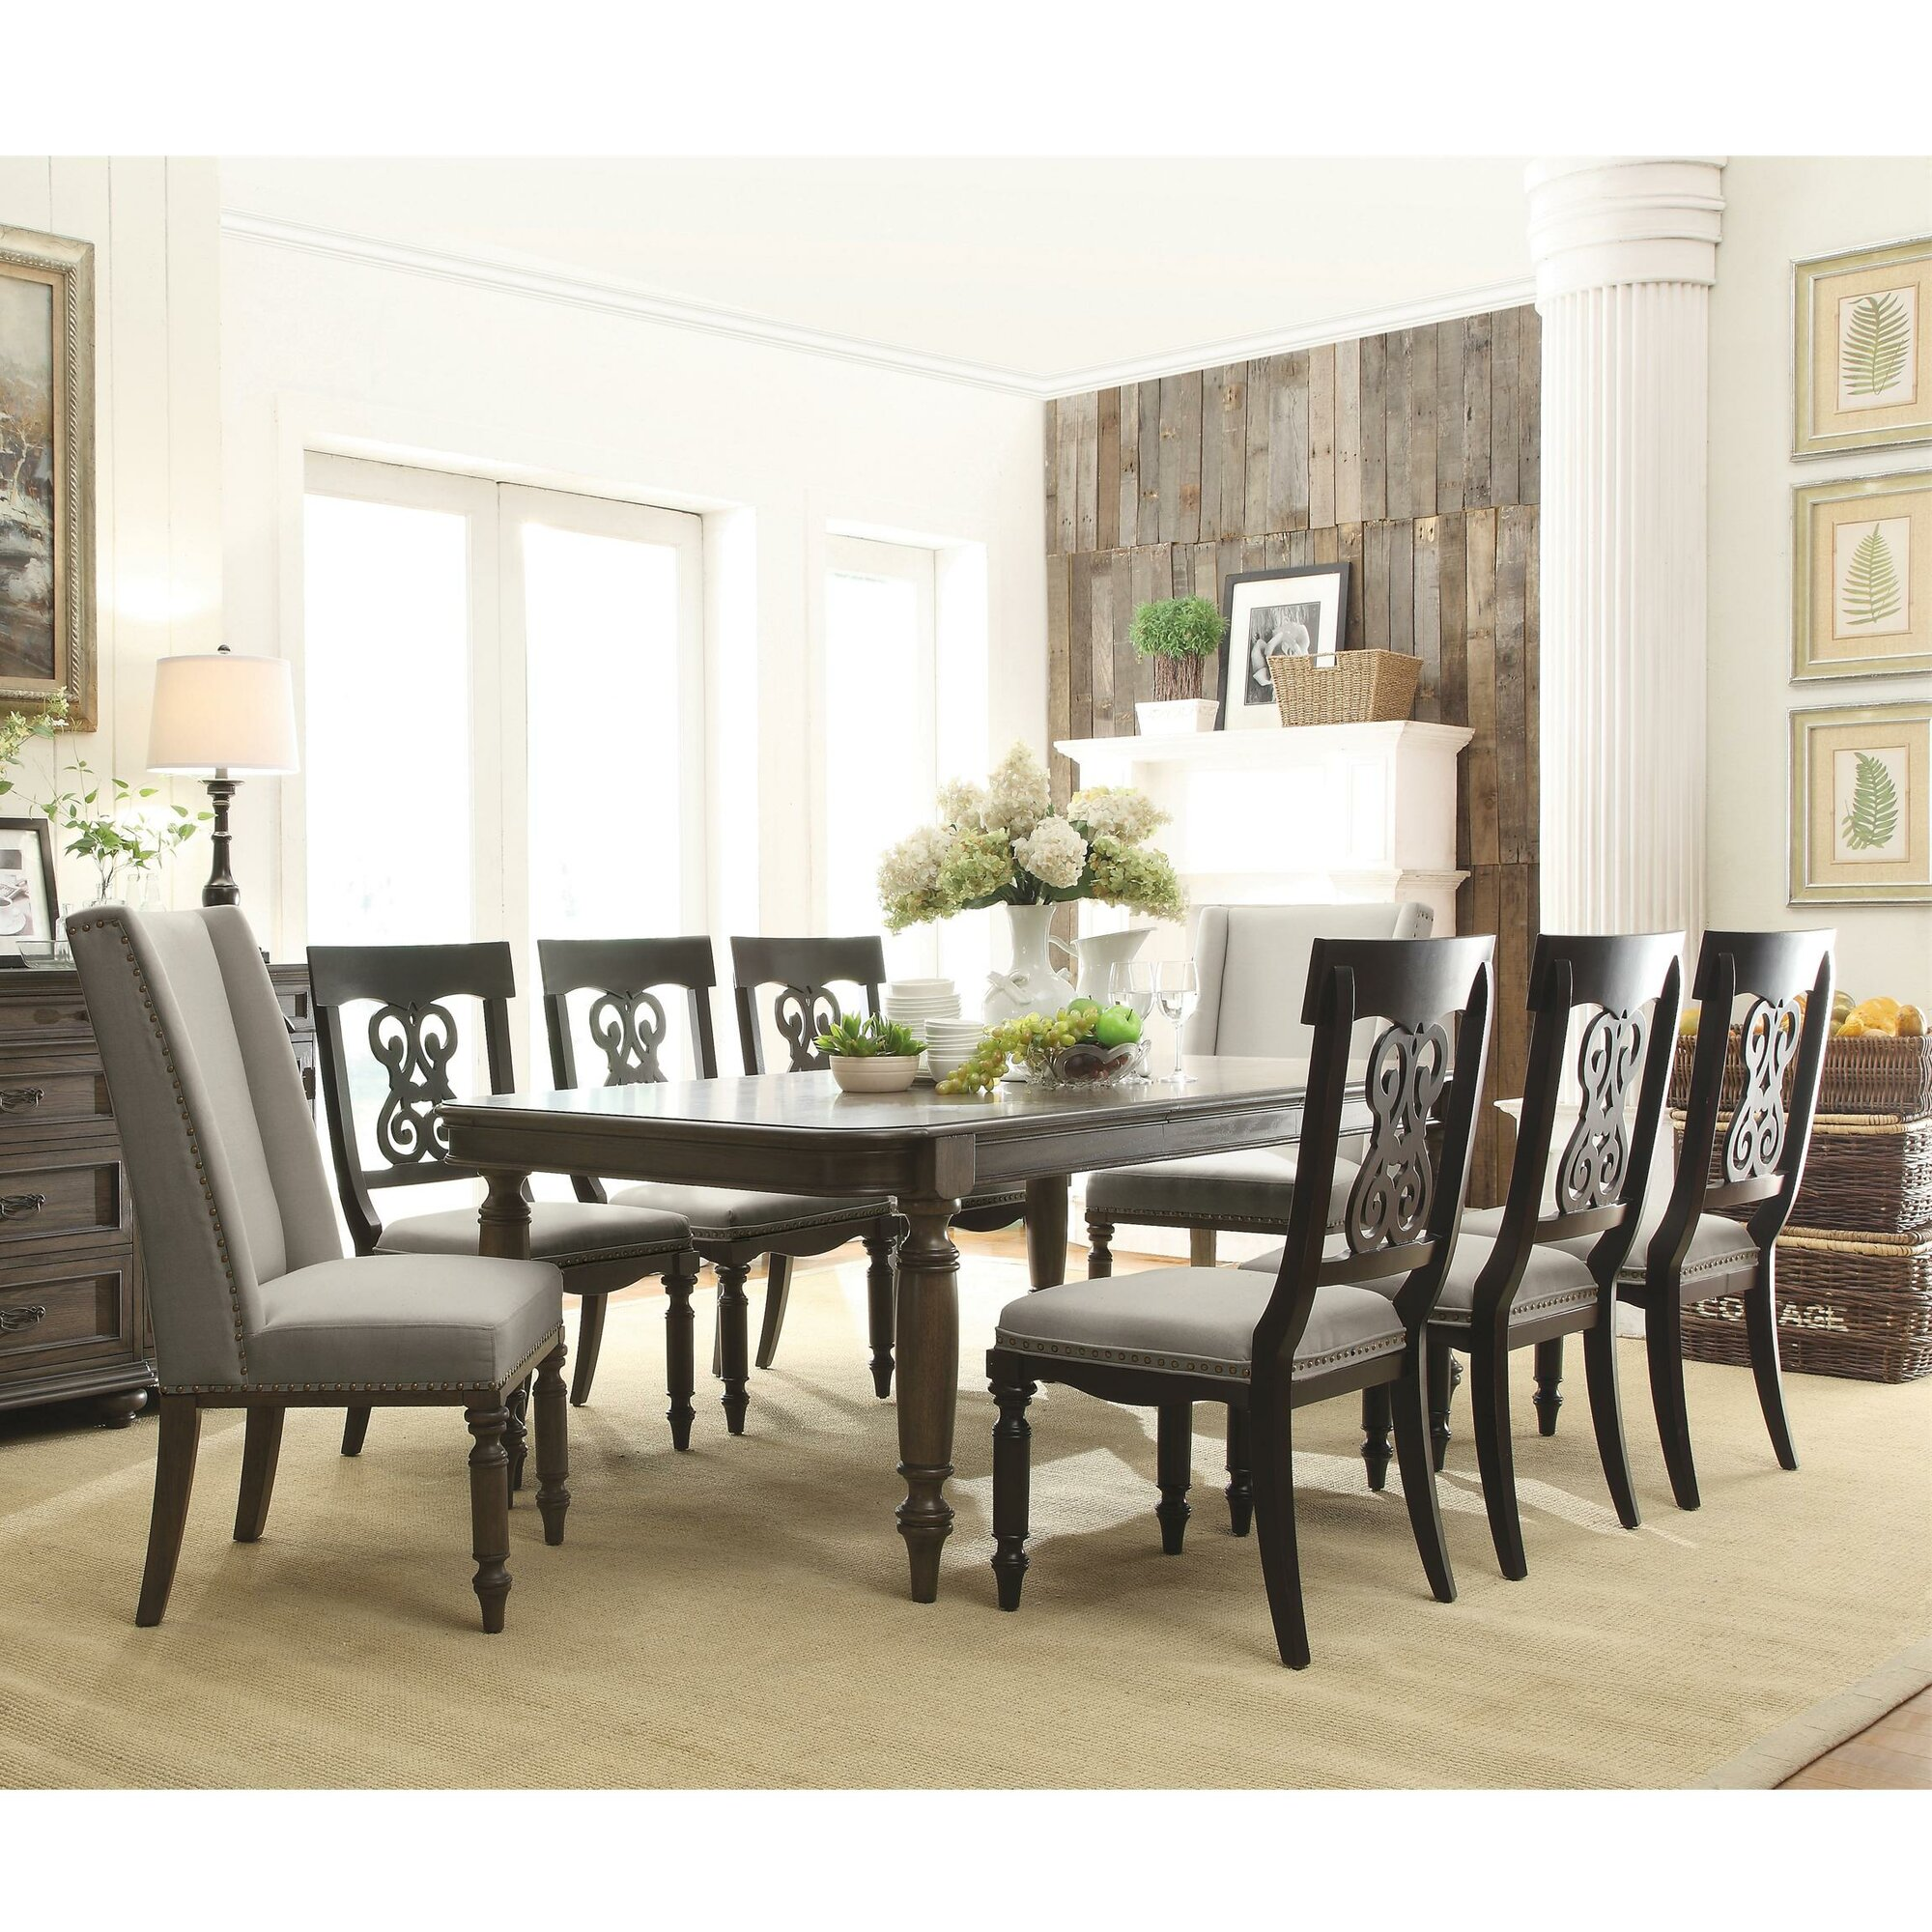 9 piece dining room sets | Rosalind Wheeler Beckles 9 Piece Dining Set & Reviews ...